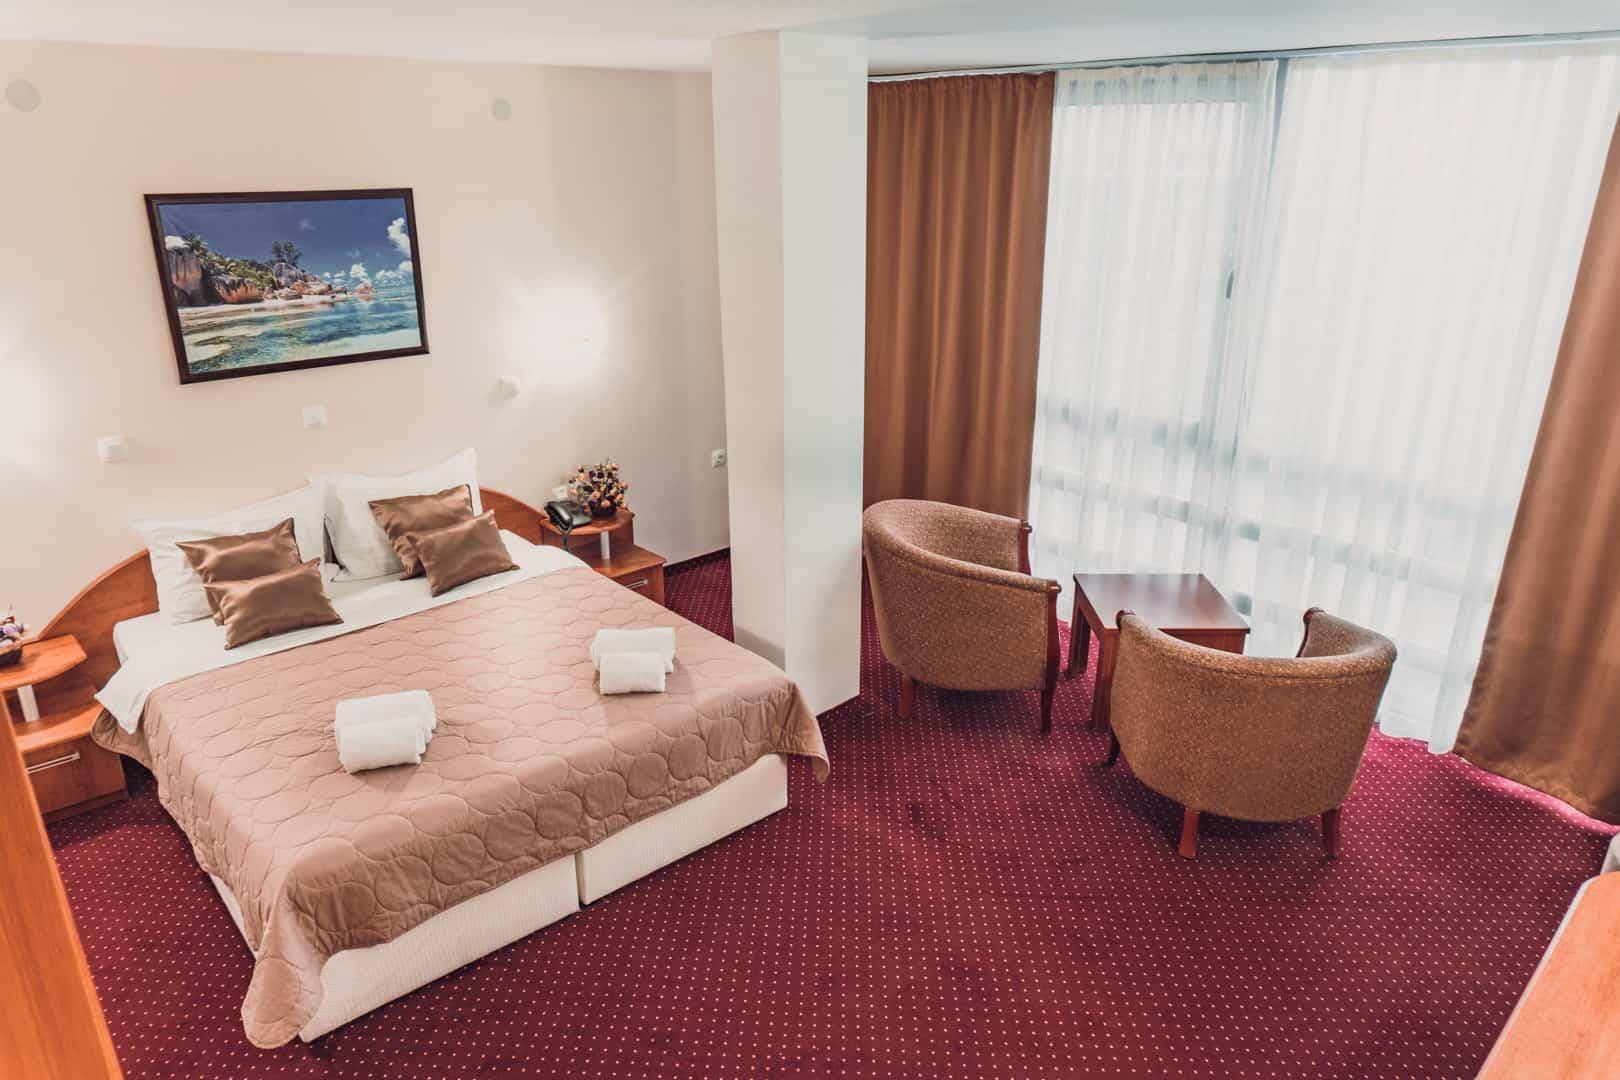 hotel-aqualina-genel-005